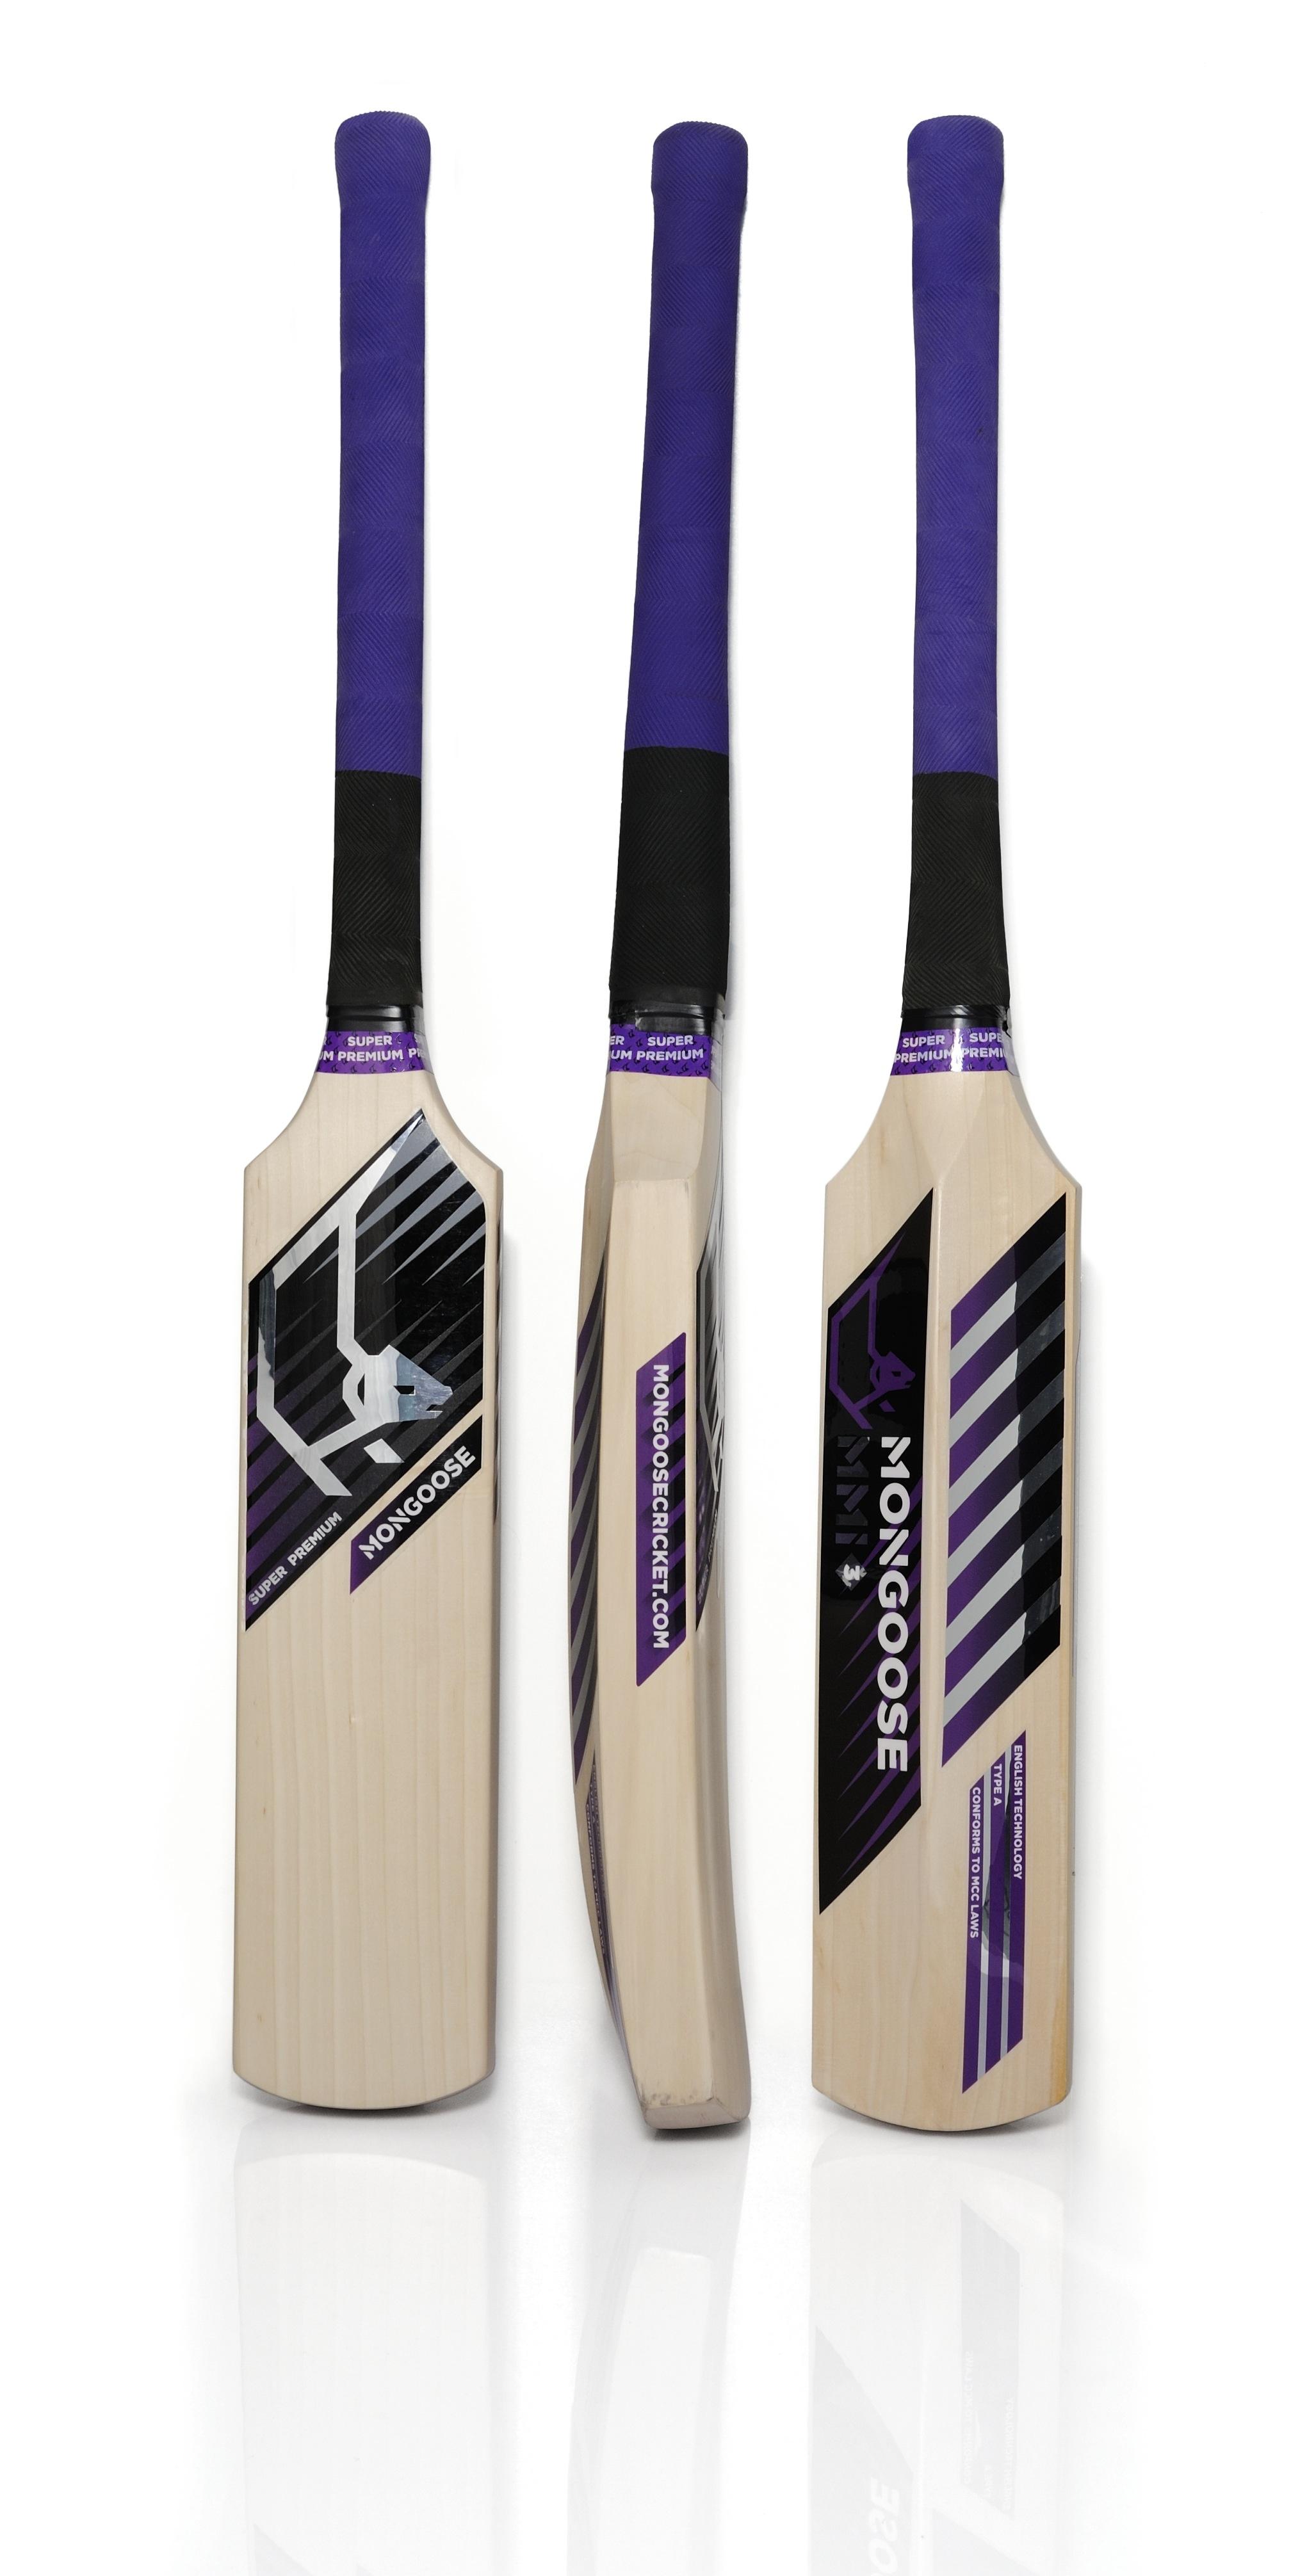 28fce9c8f07 Strange cricket bats part 2 - Cricket Store Online